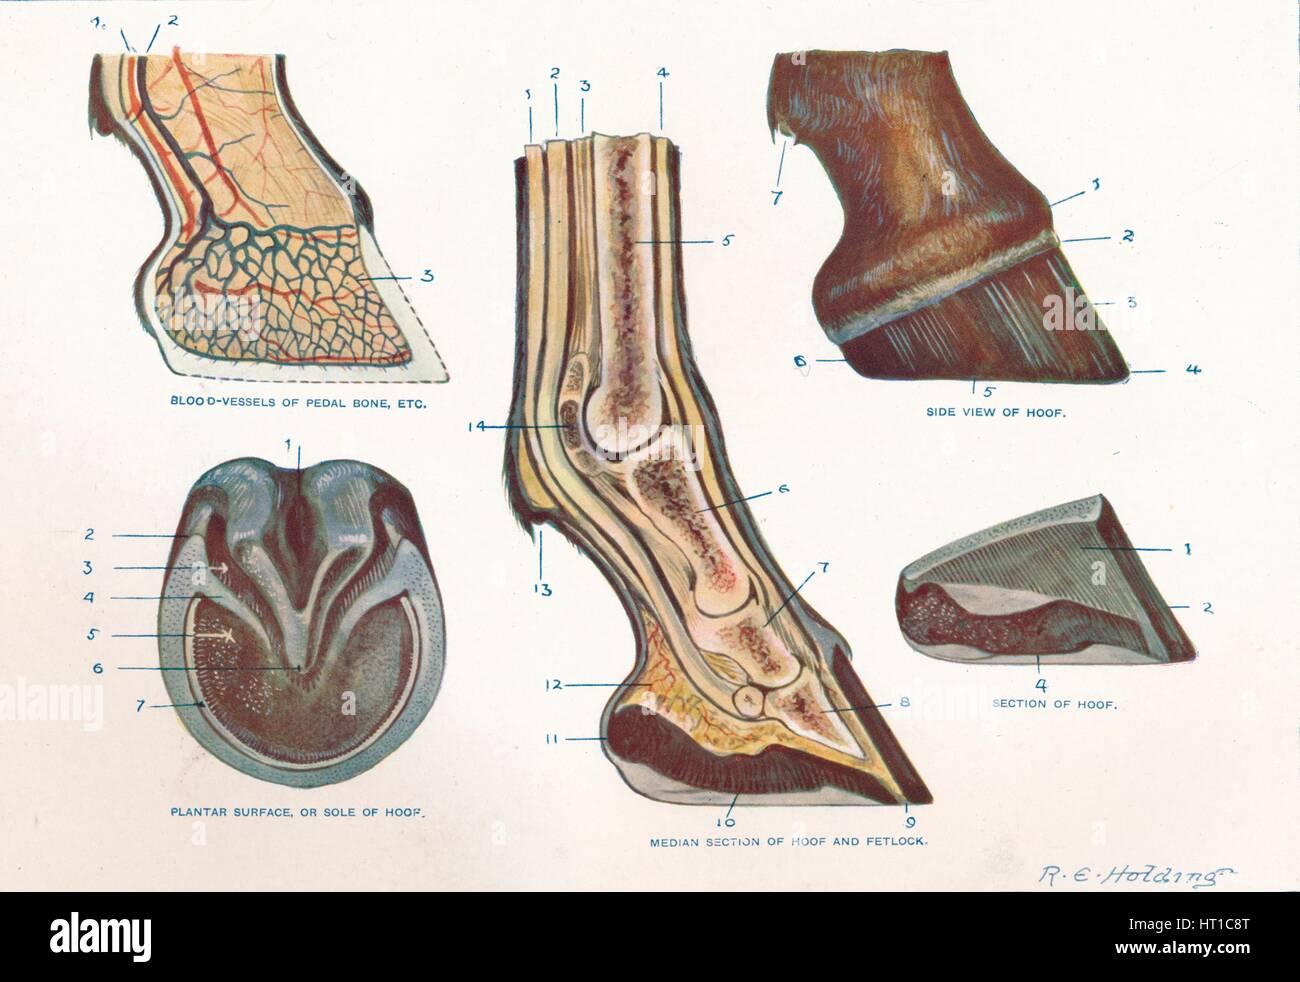 Horse Hoof Print Stock Photos & Horse Hoof Print Stock Images - Alamy